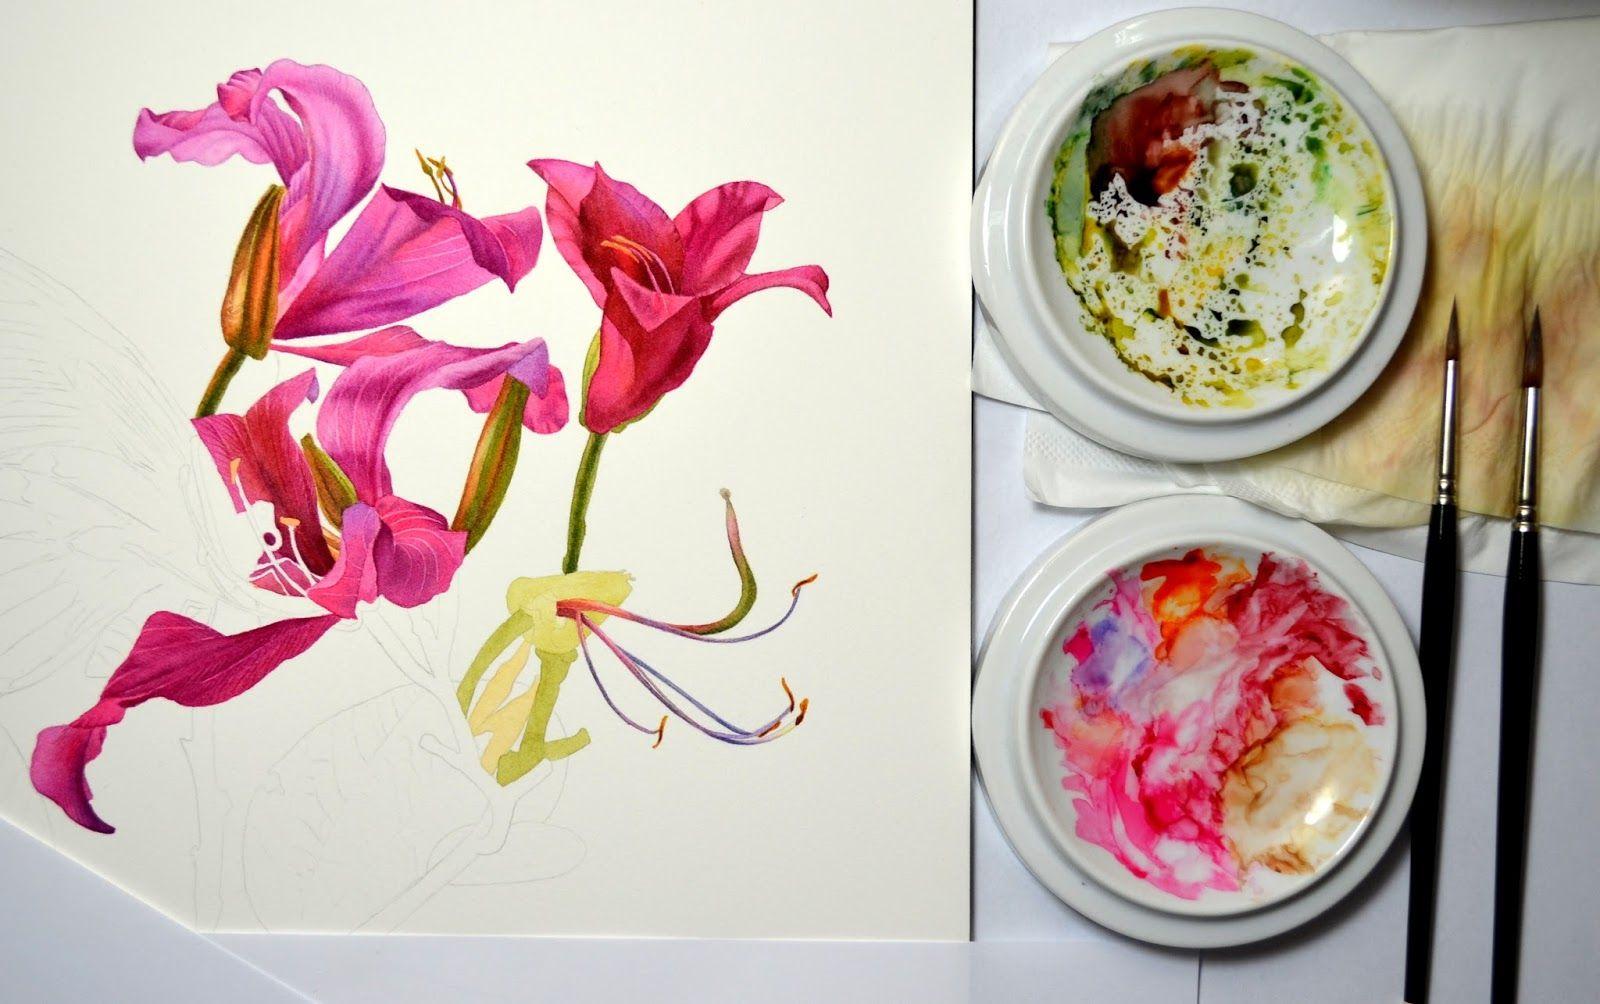 Botanical and Nature Art by Krzysztof Kowalski: Orchid Tree. Slow progress